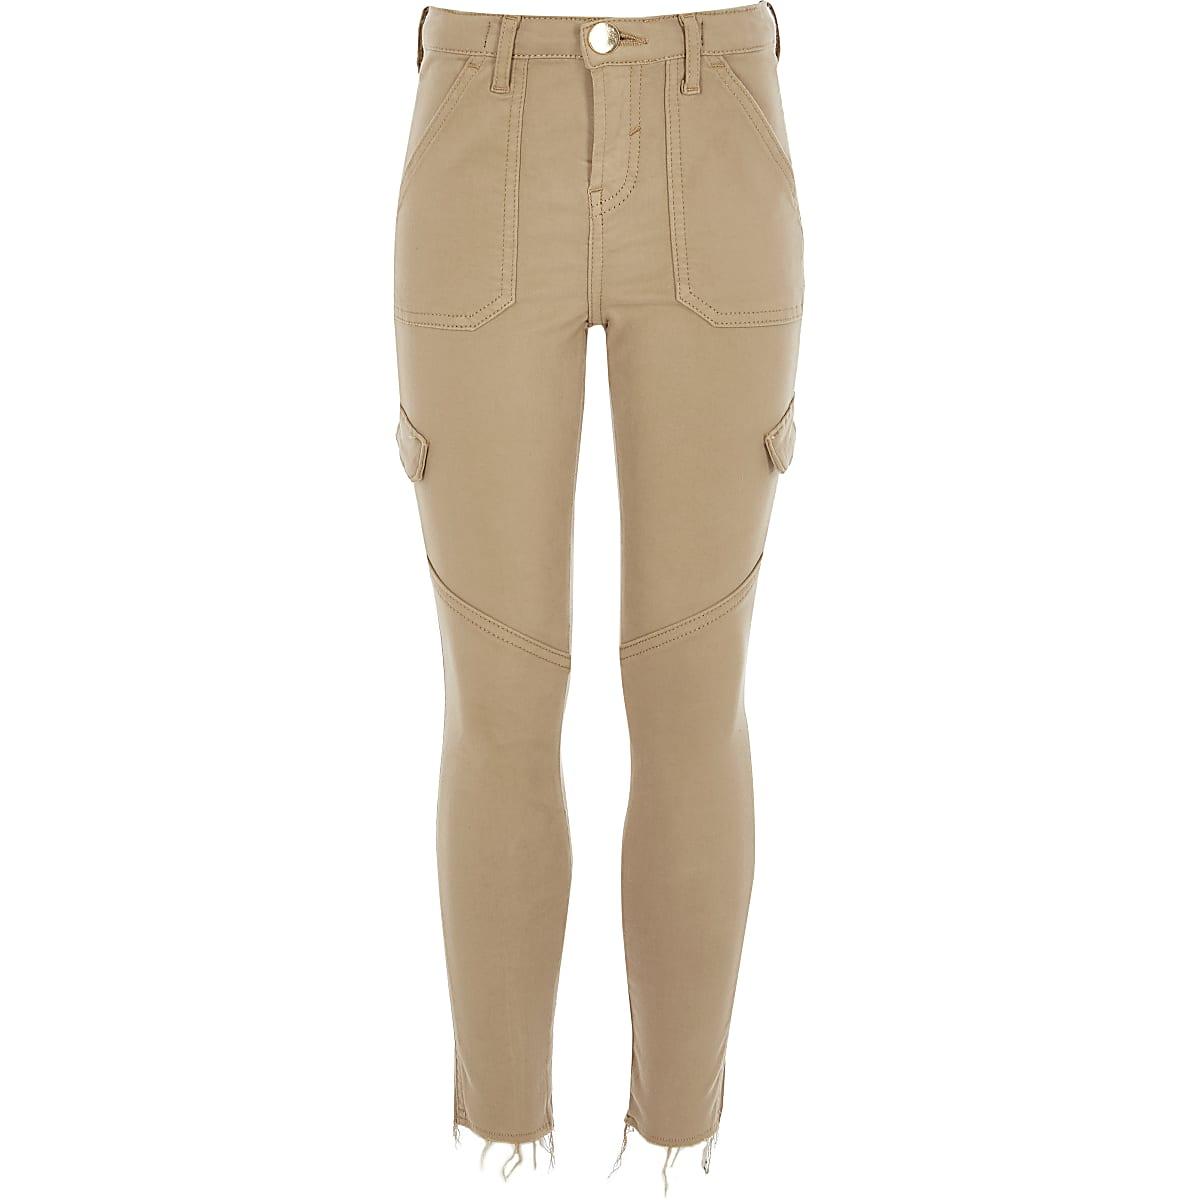 Amelie - Kiezelkleurige skinny jeans voor meisjes